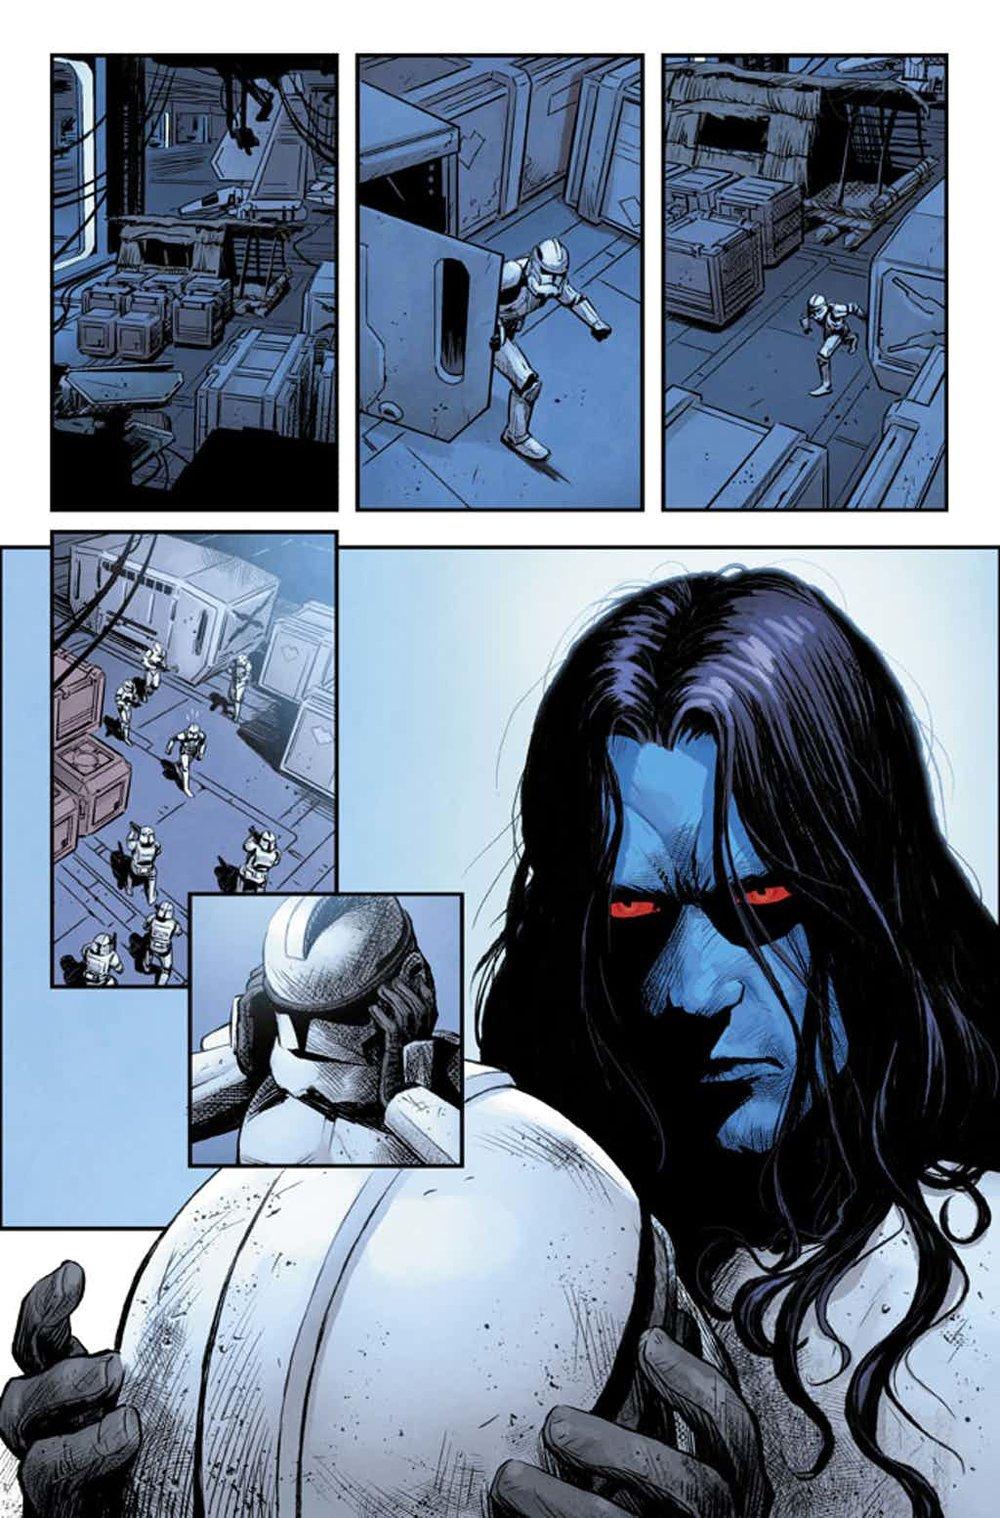 Marvel-Thrawn-Comic-Page-4.jpg